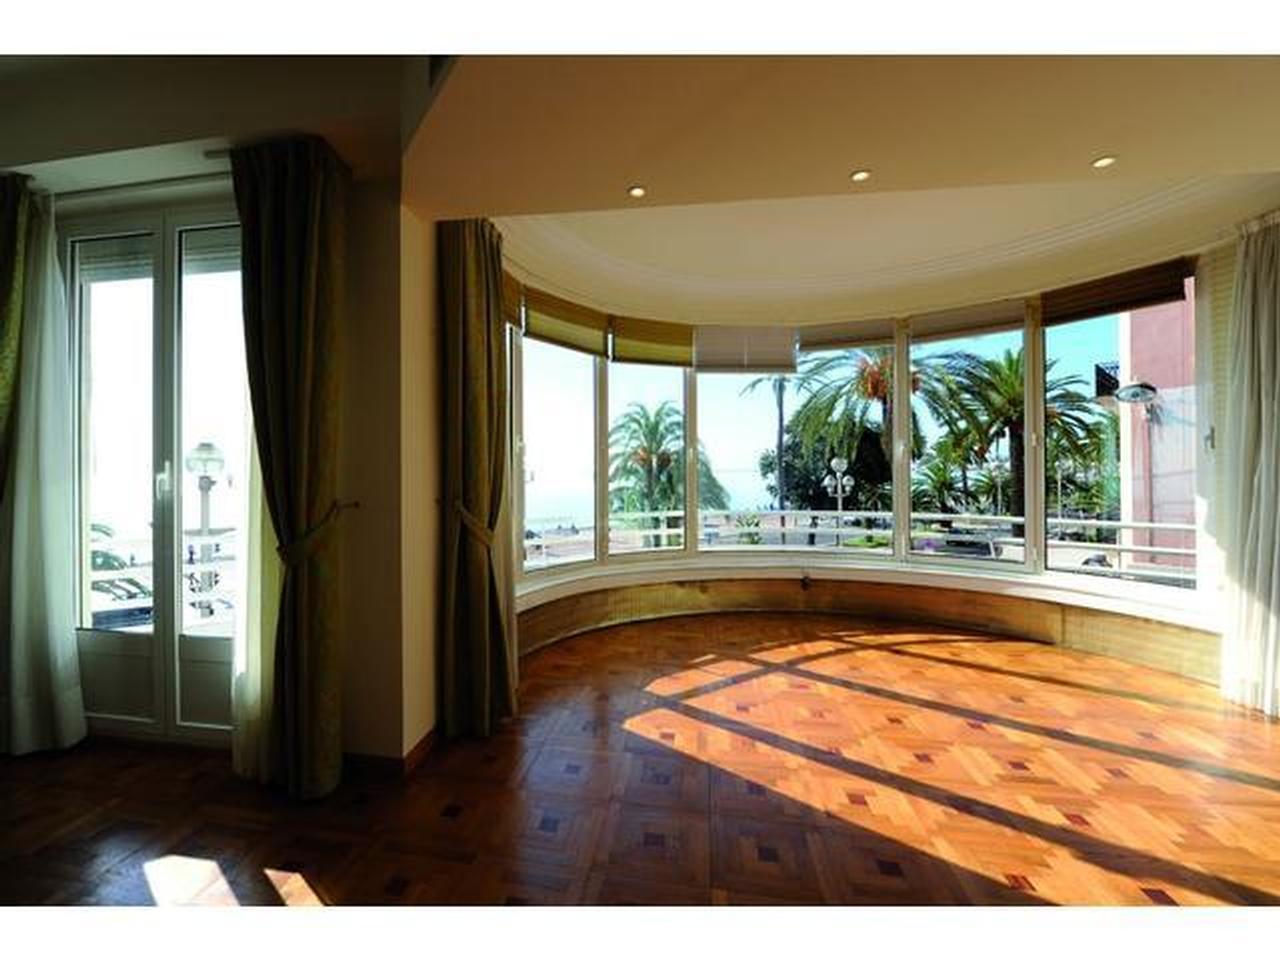 immobilier nice vue mer appartement nice 3 pieces grand sejour et balcon promenade des anglais. Black Bedroom Furniture Sets. Home Design Ideas